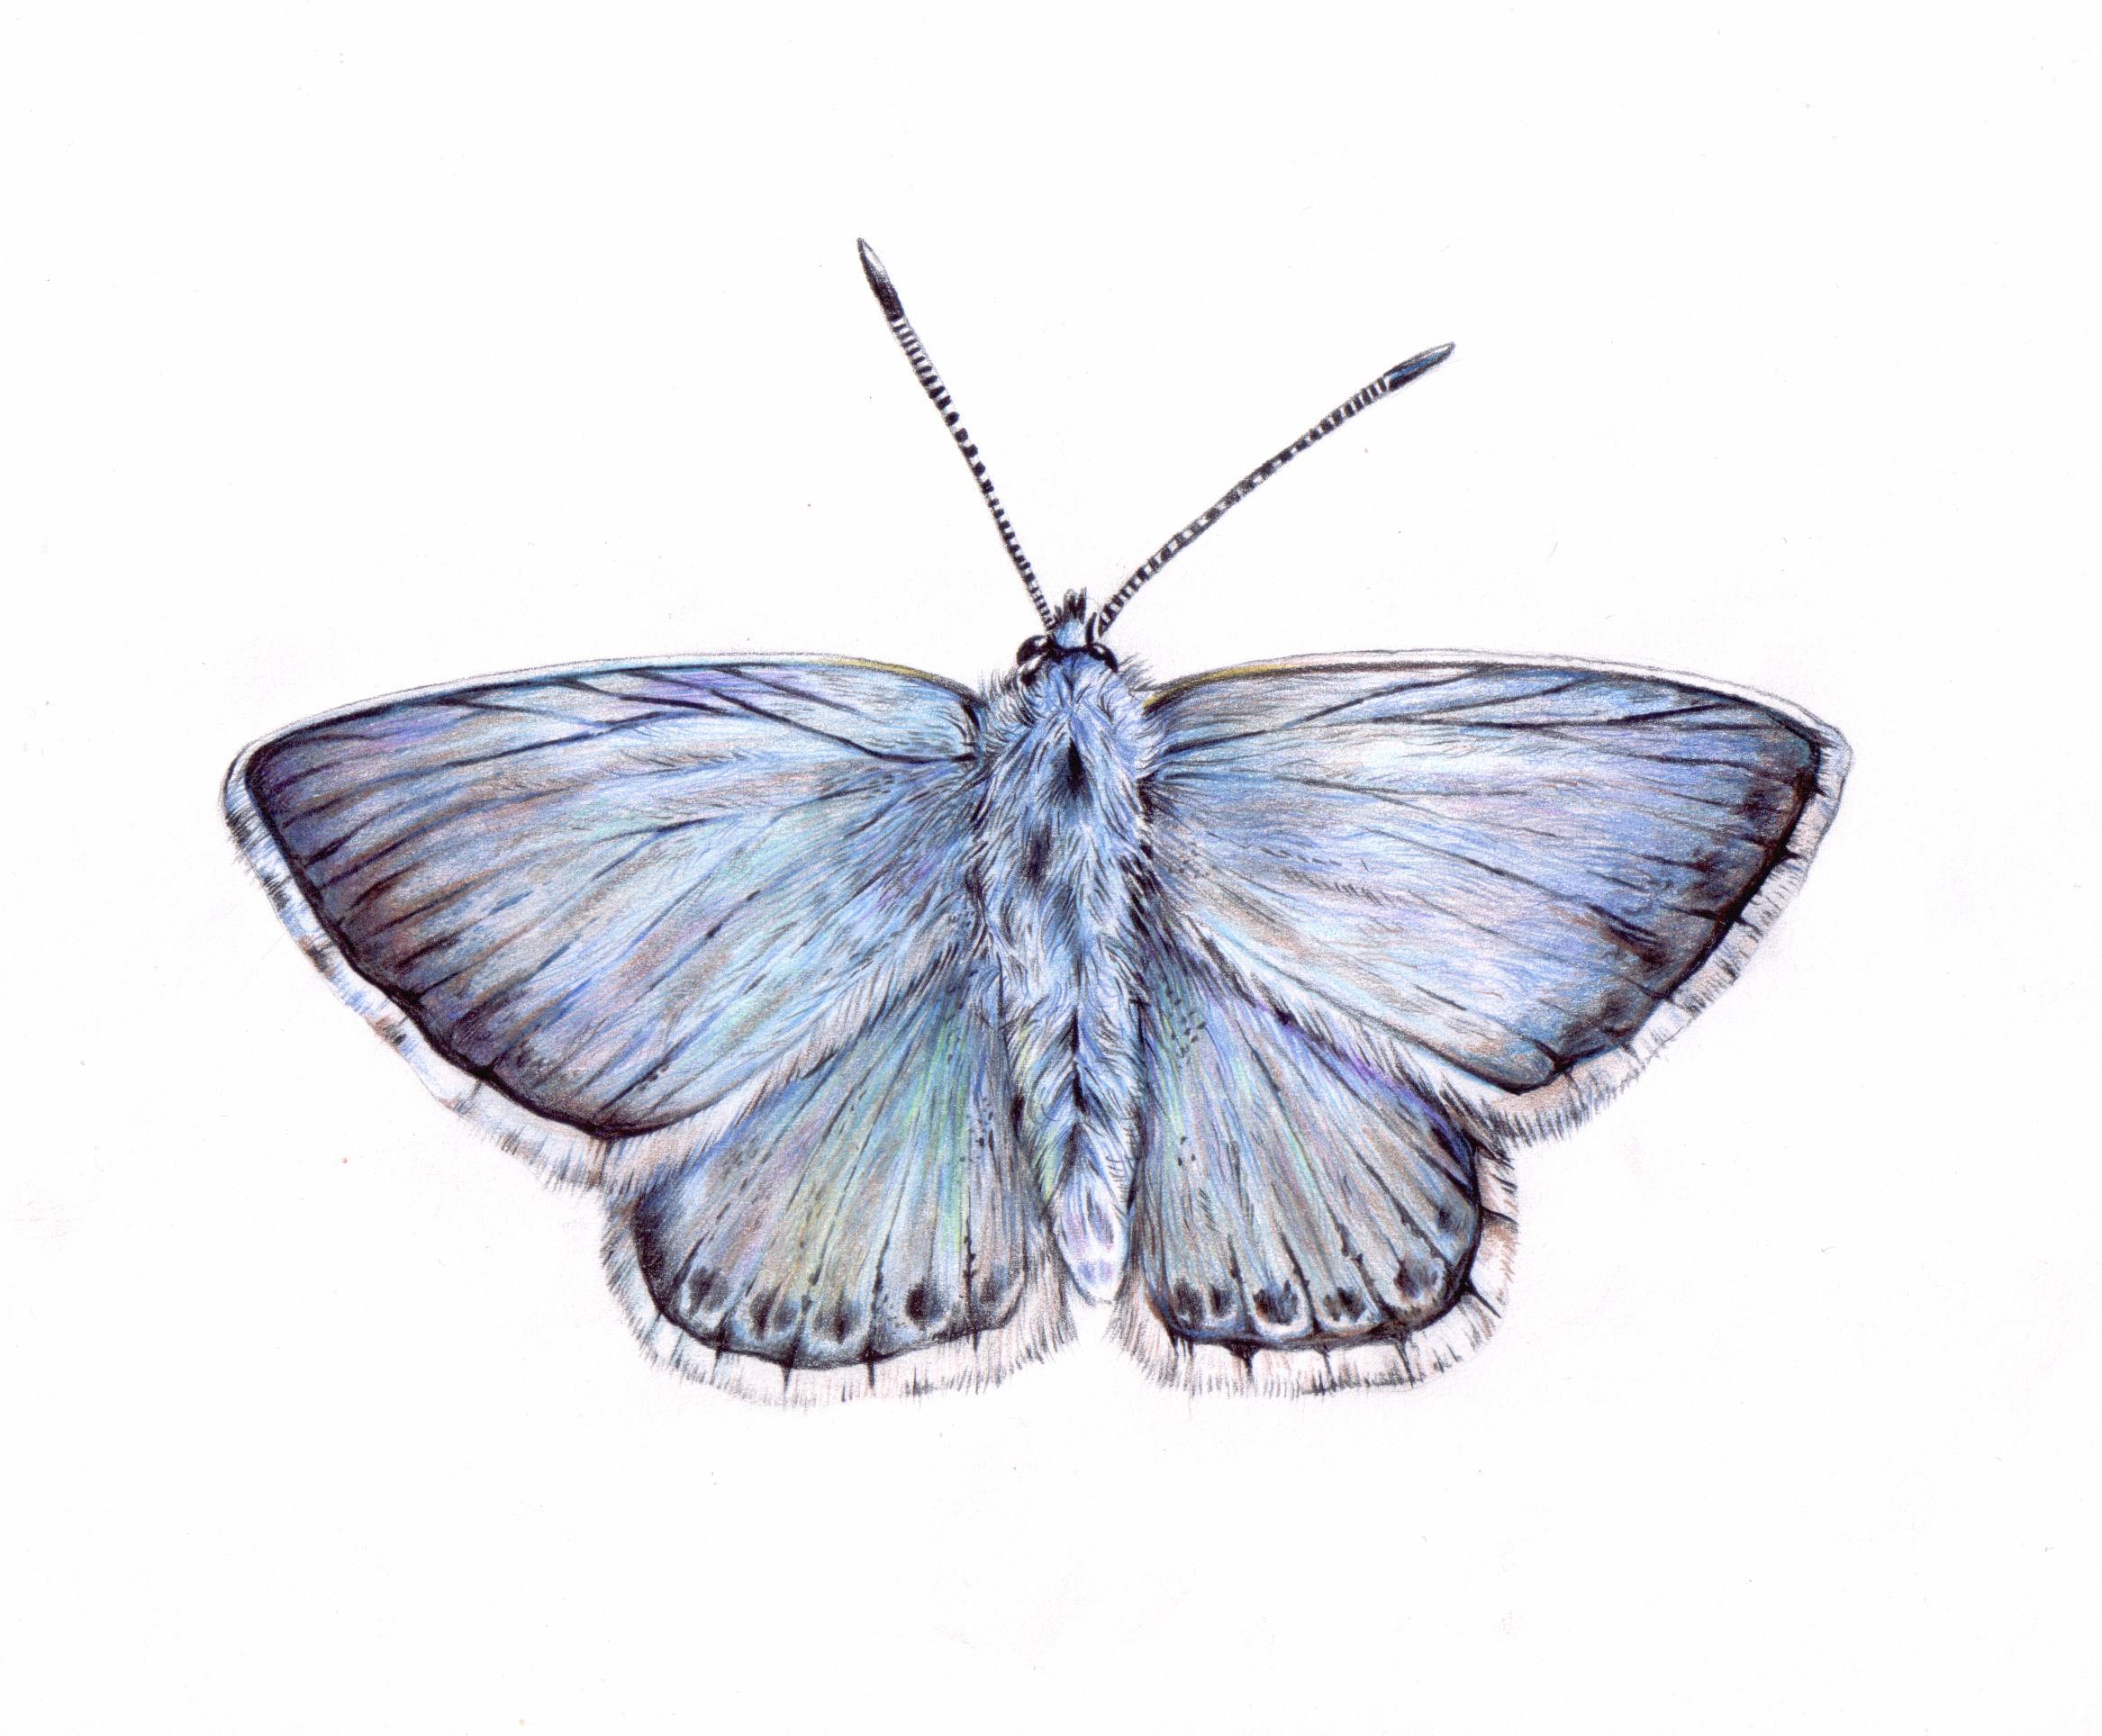 Chalkhill Blue Butterfly Illustration